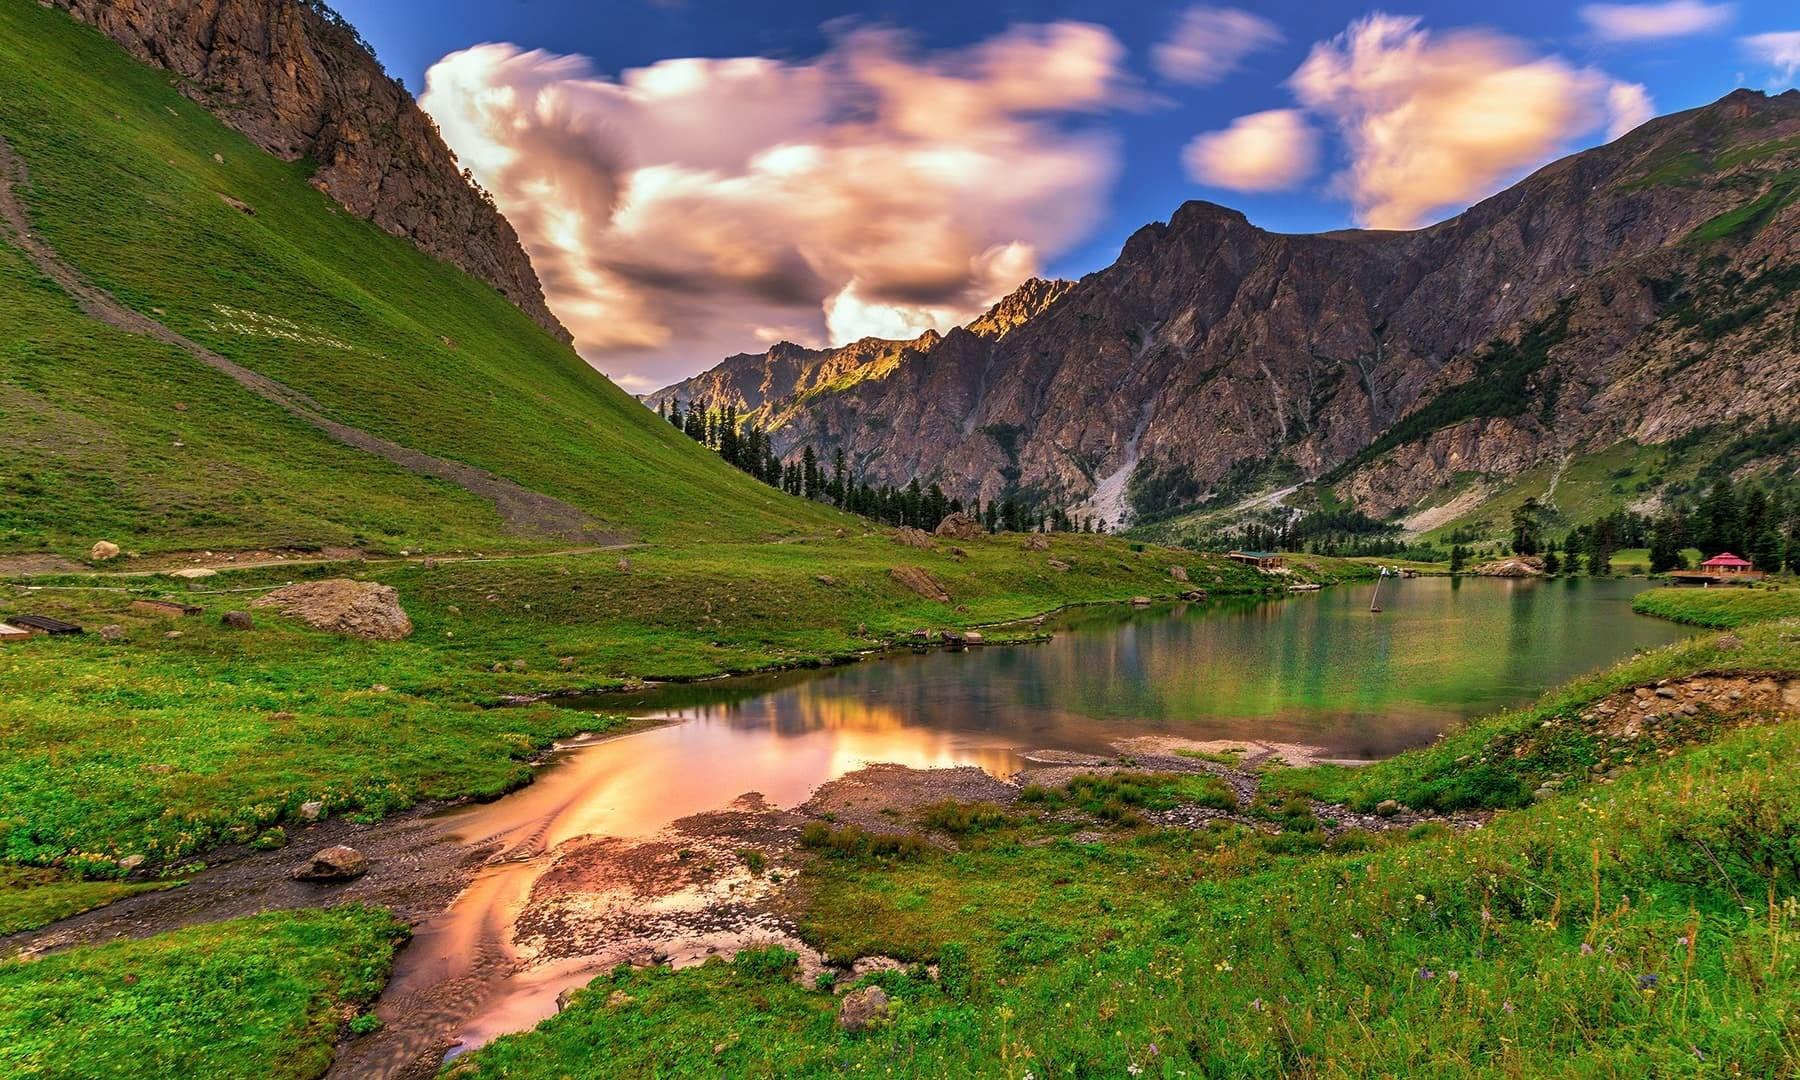 View of Rainbow Lake. — Photo by Syed Mehdi Bukhari